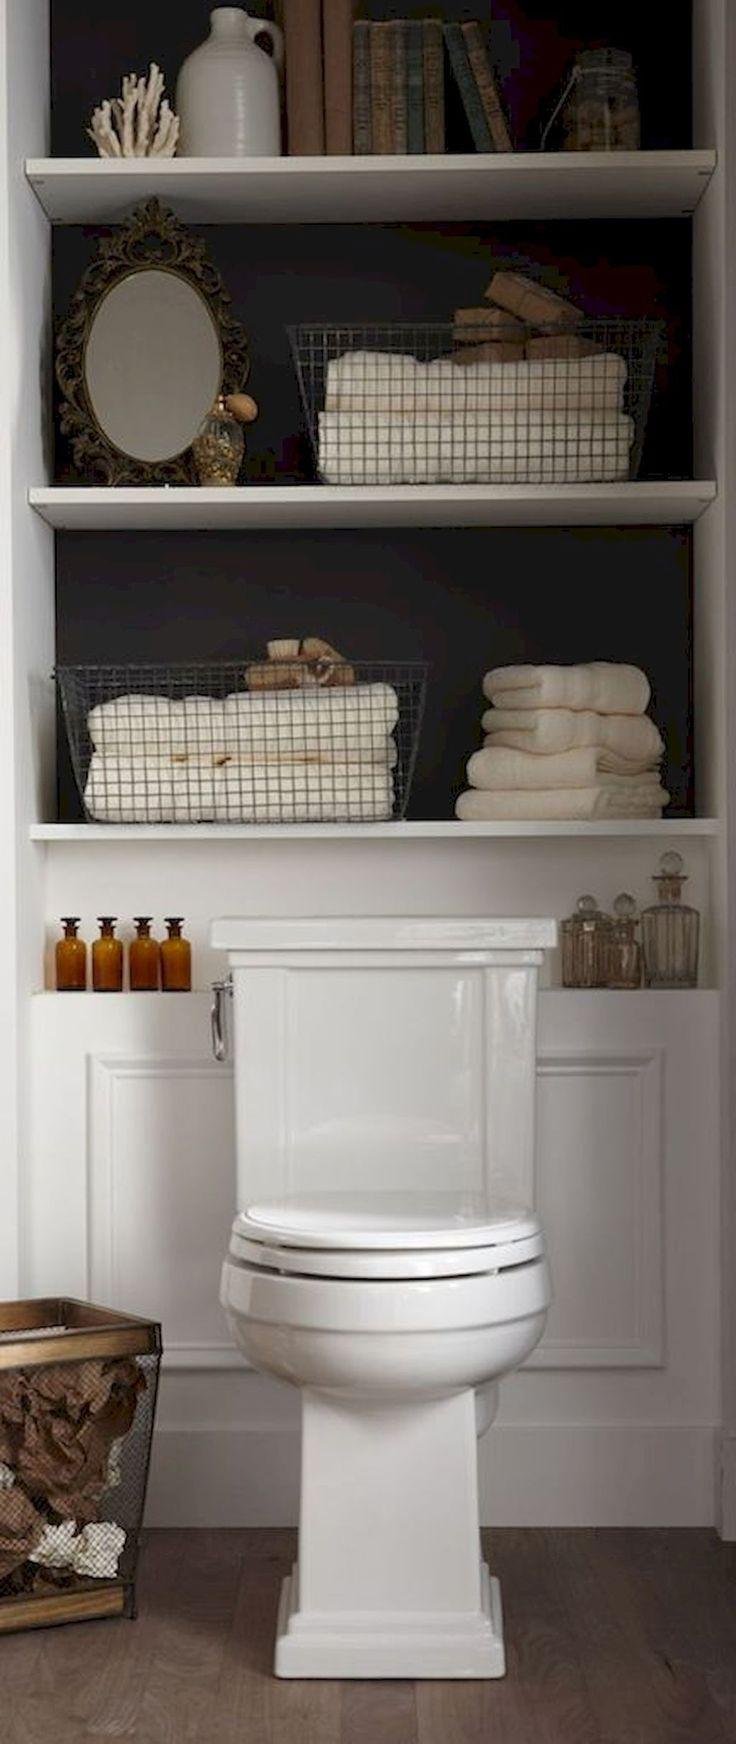 Adorable 50 Bliliant and Easy Bathroom Organization